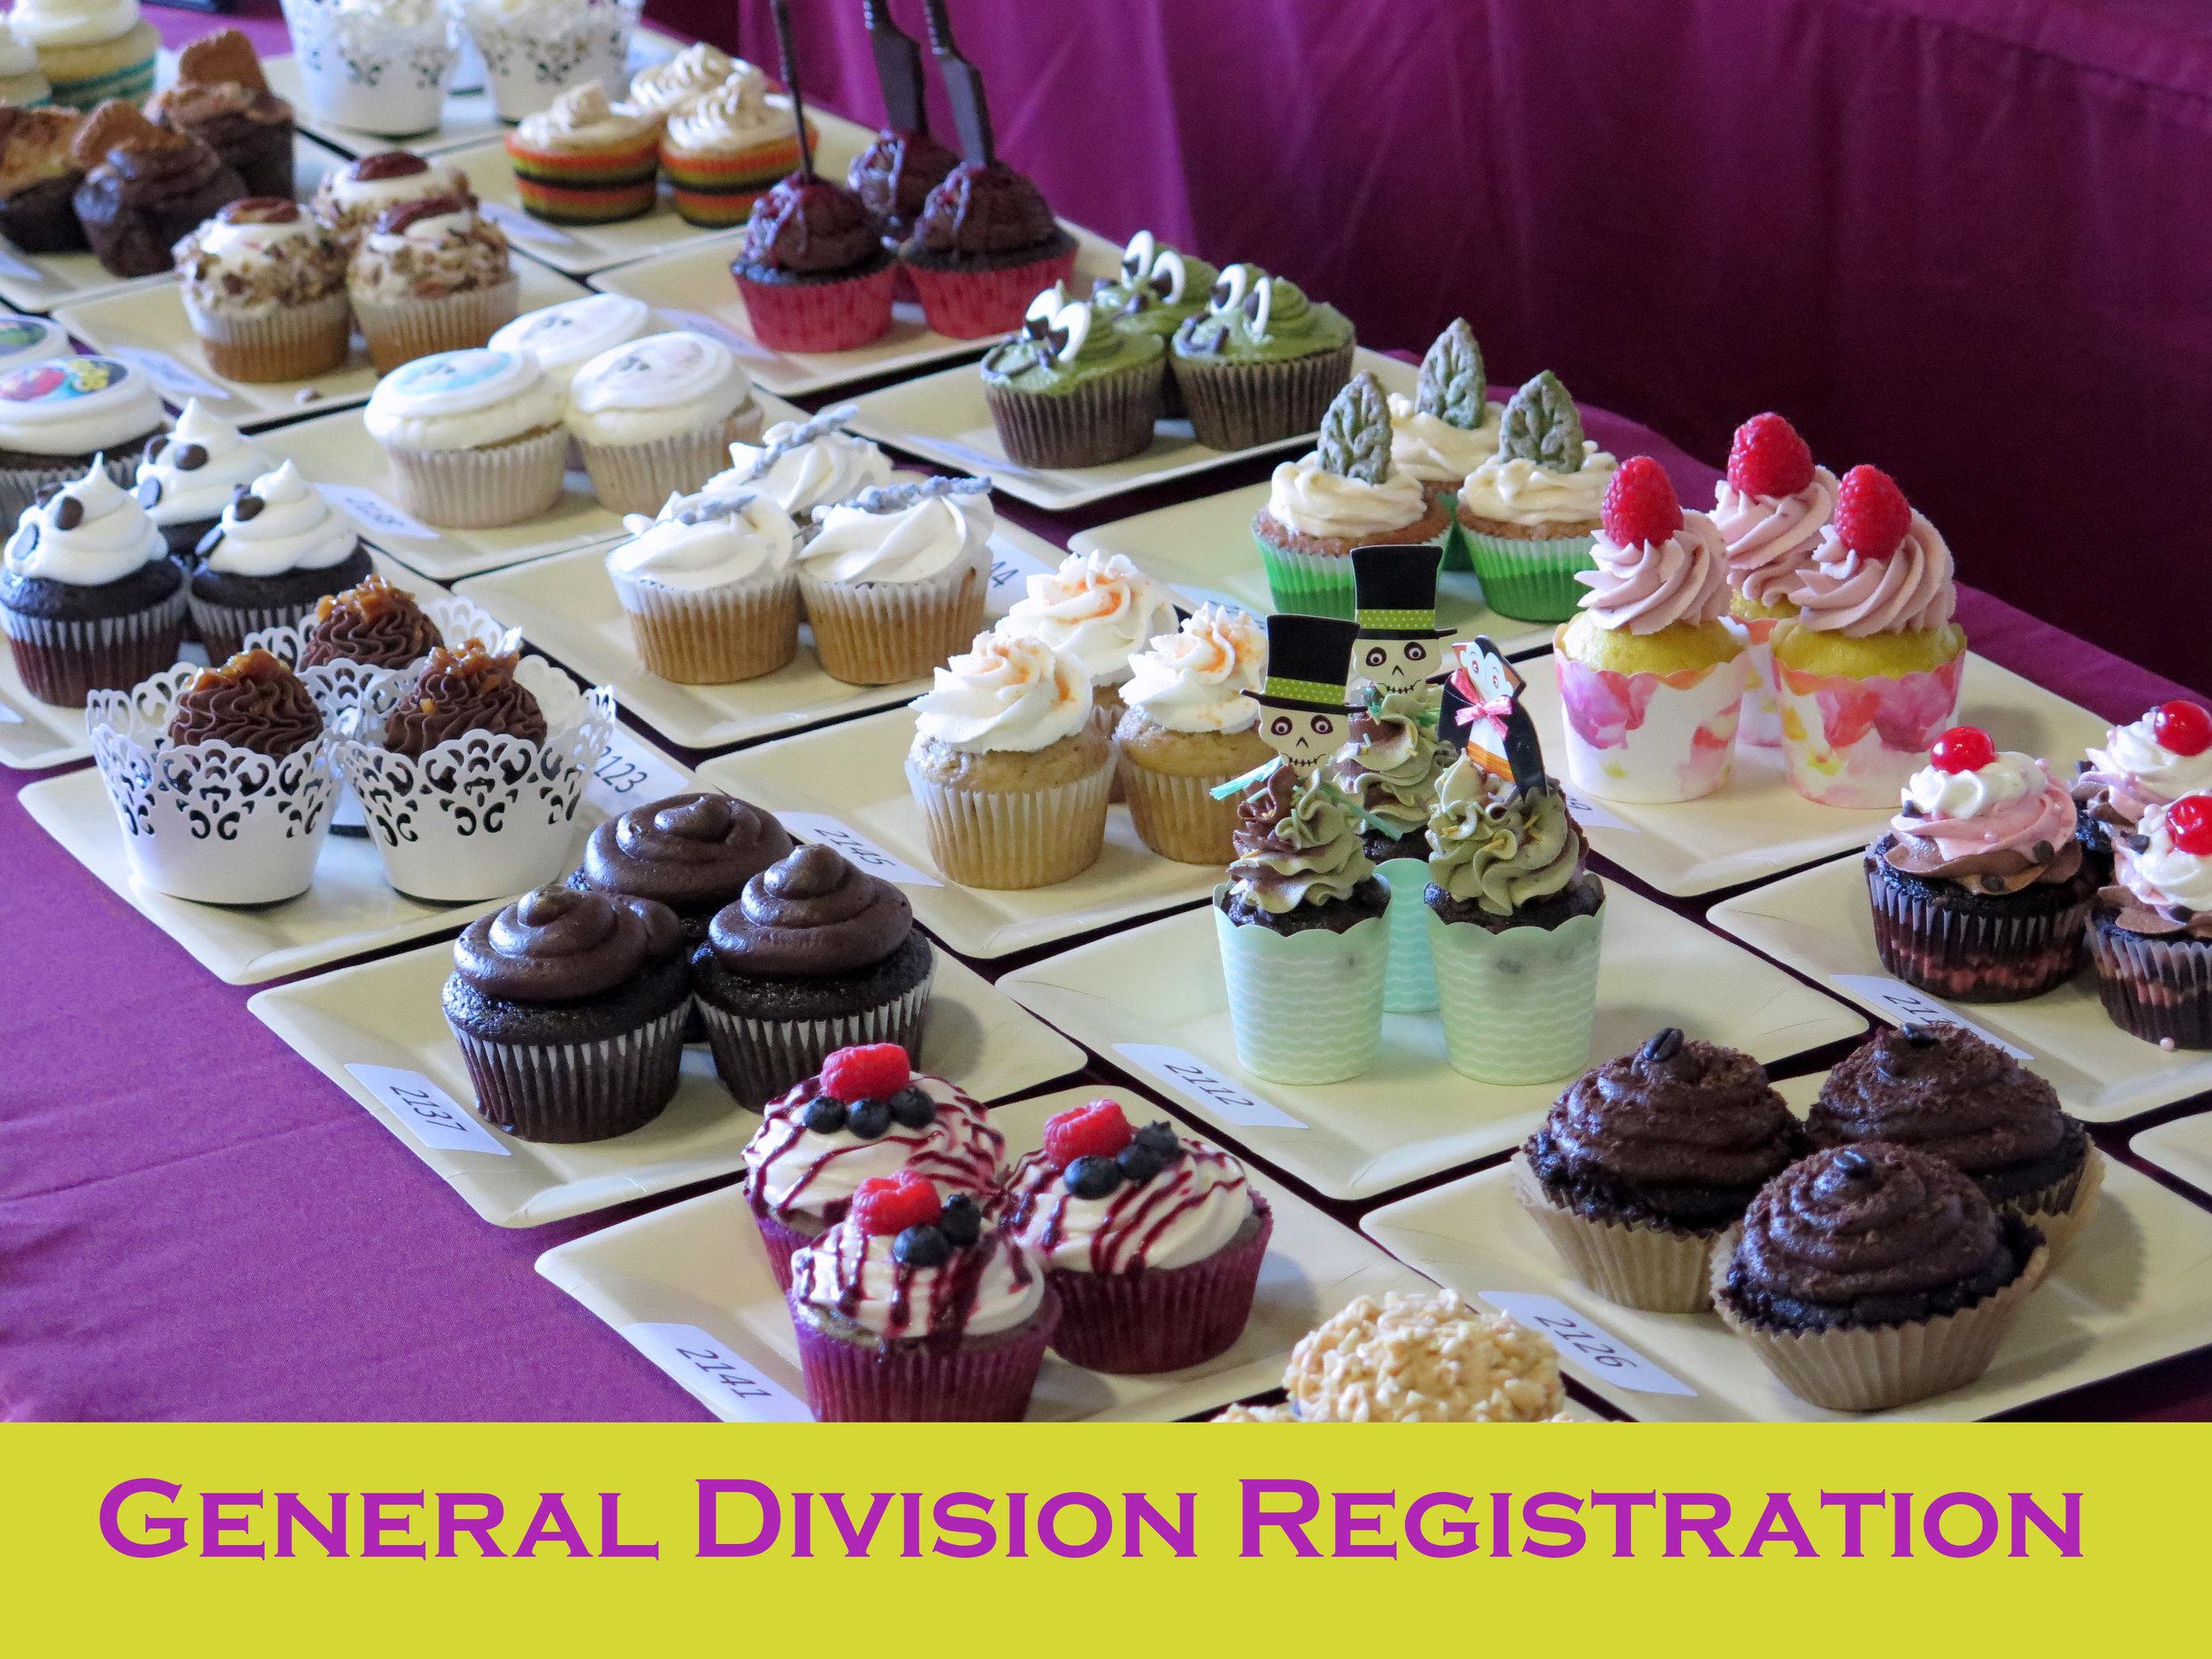 General Division Registration photo button.jpg